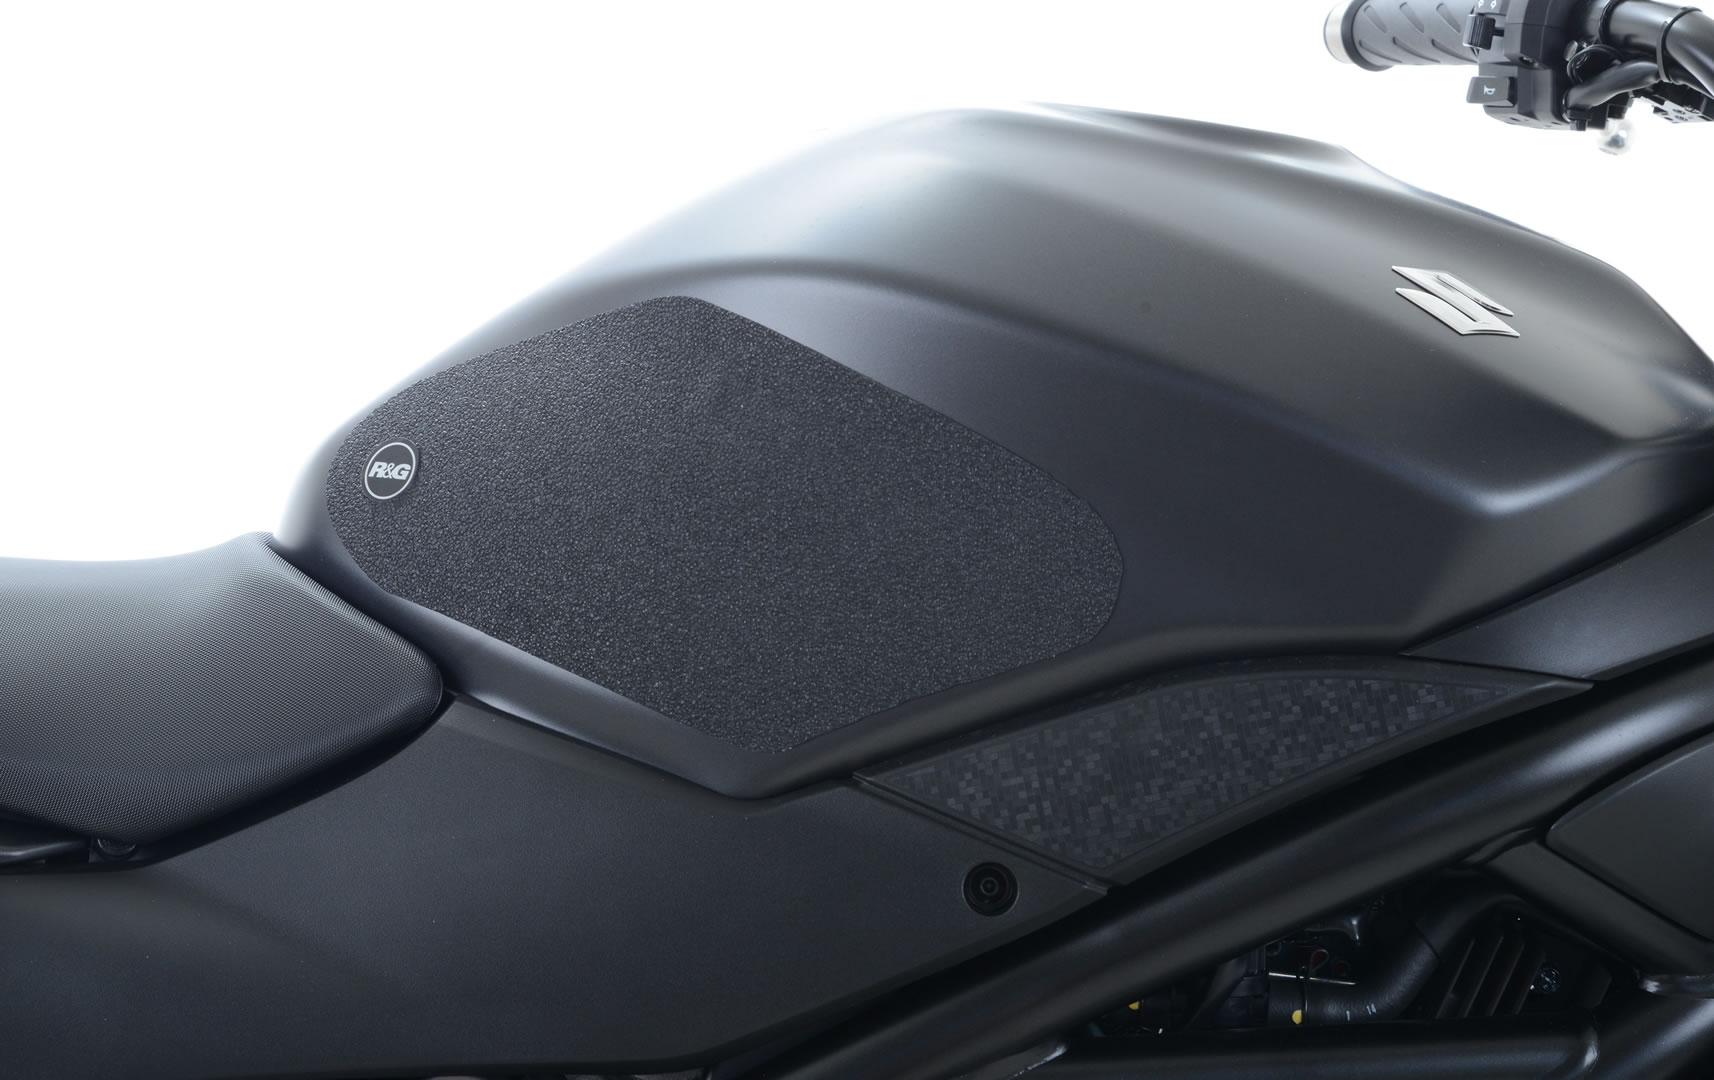 Kit grip de réservoir R&G Racing translucide Suzuki SV 650 16-18